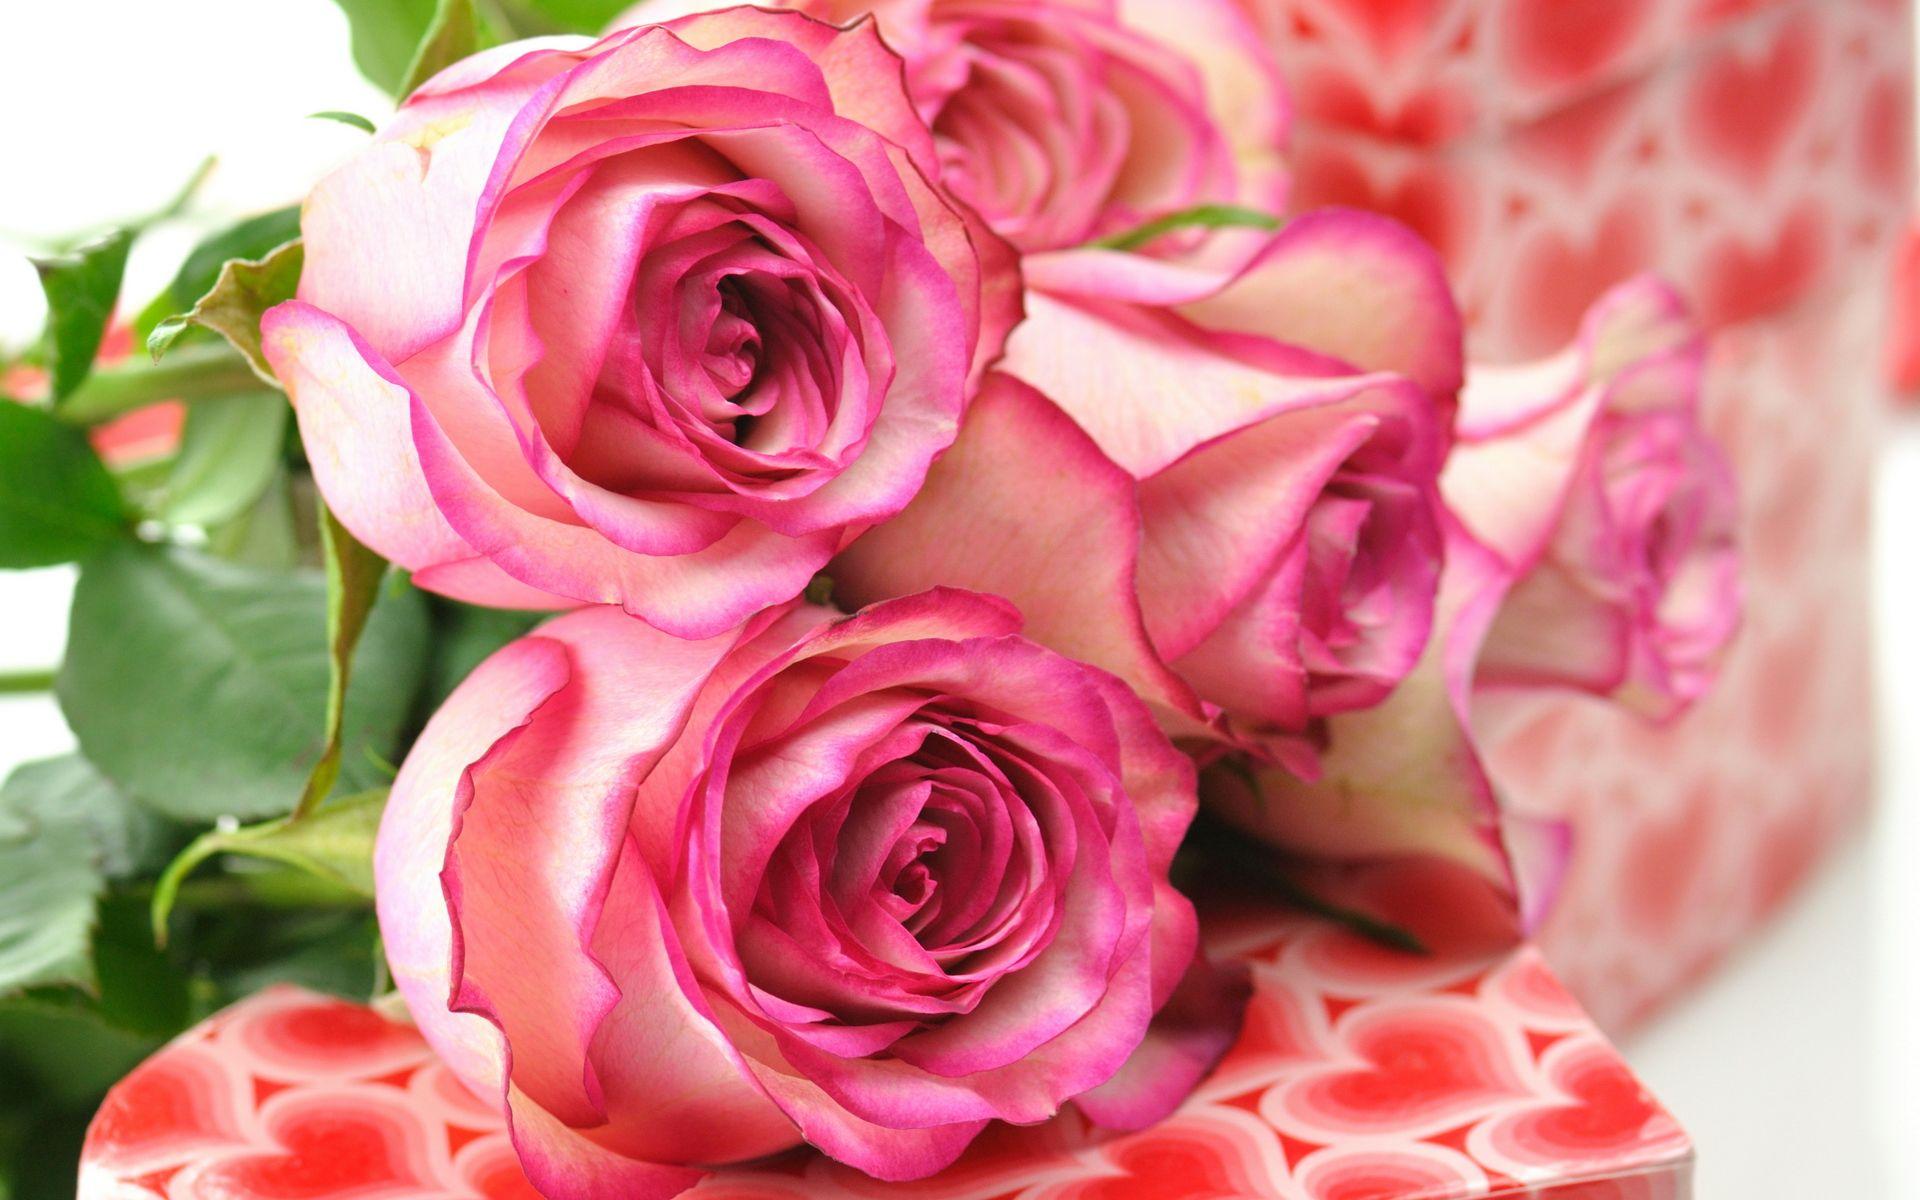 Beautiful Pink Rose Flower Wallpaper Free wallpaper download